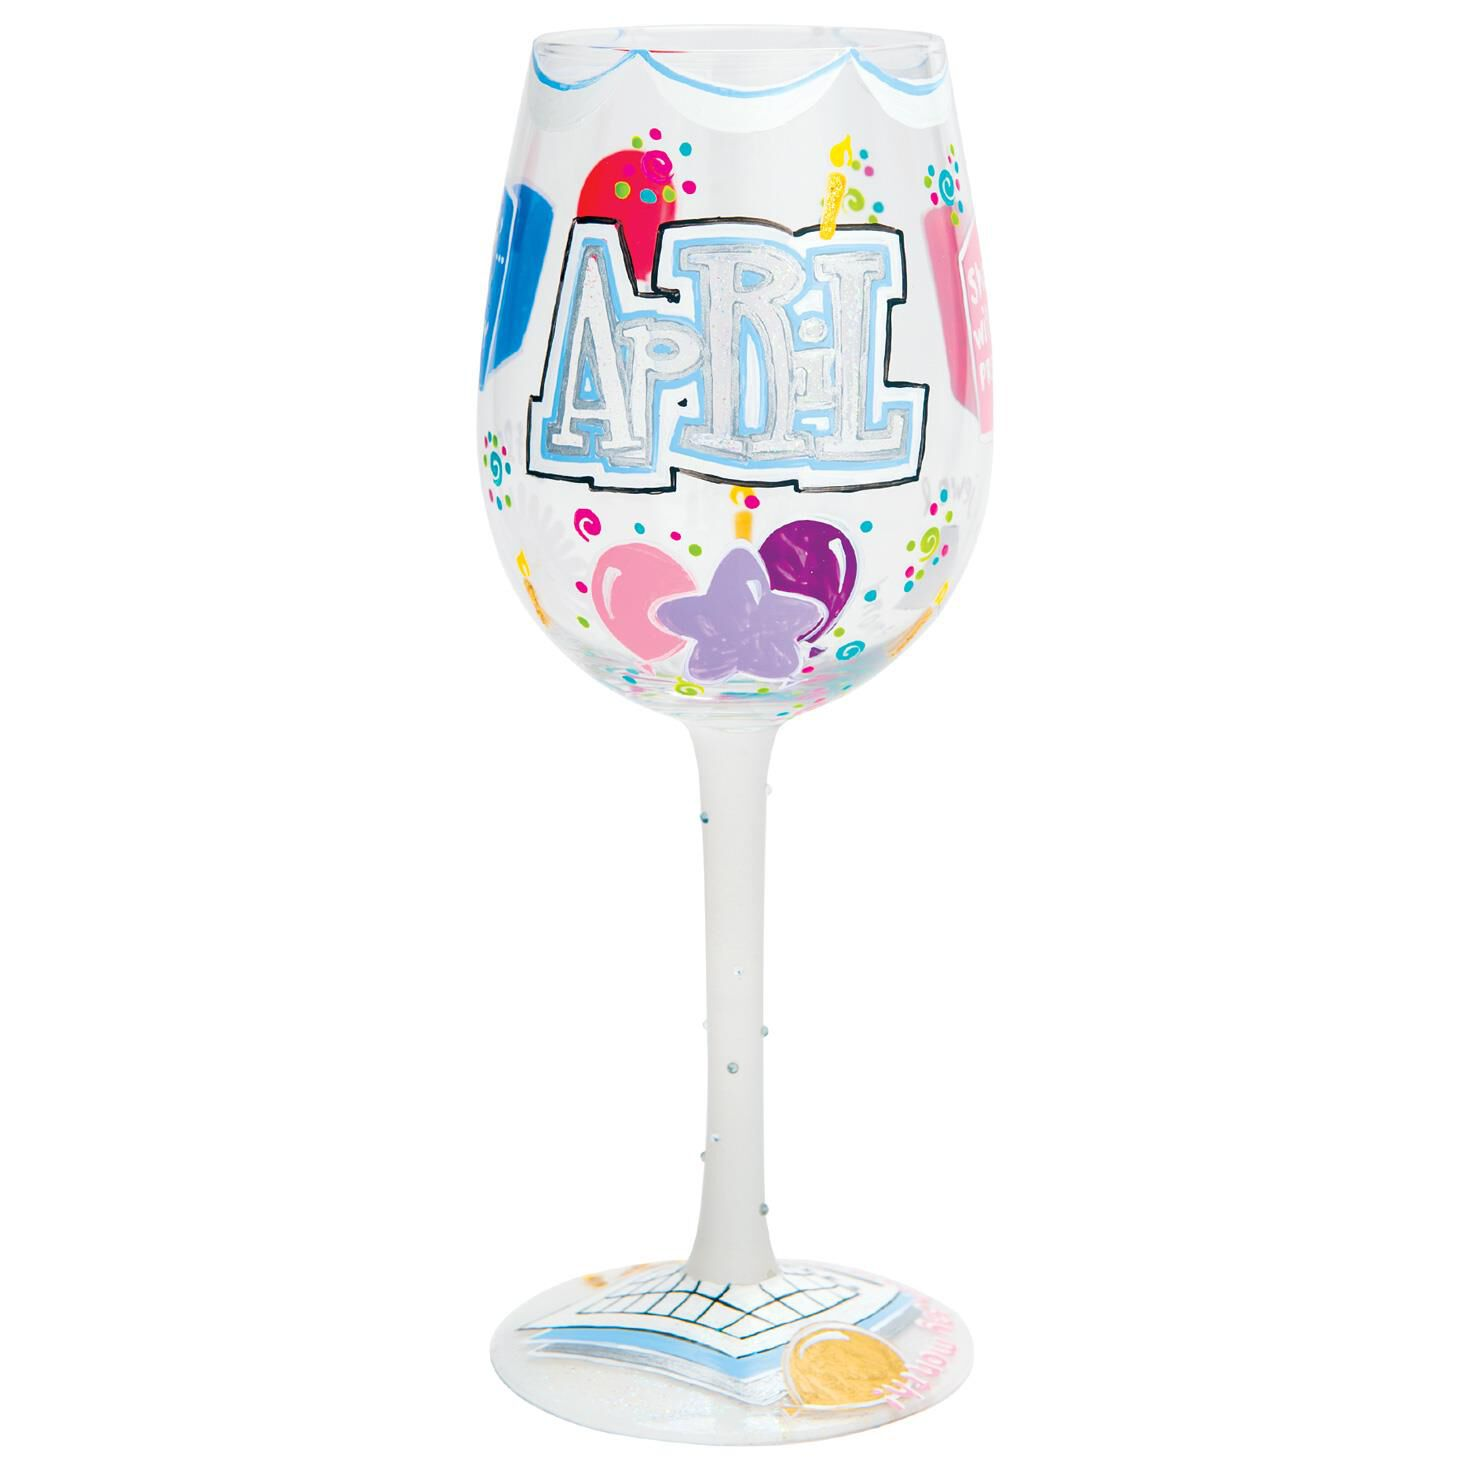 lolita april happy birthday handpainted wine glass 15 oz wine glasses hallmark - Happy Birthday Wine Glass